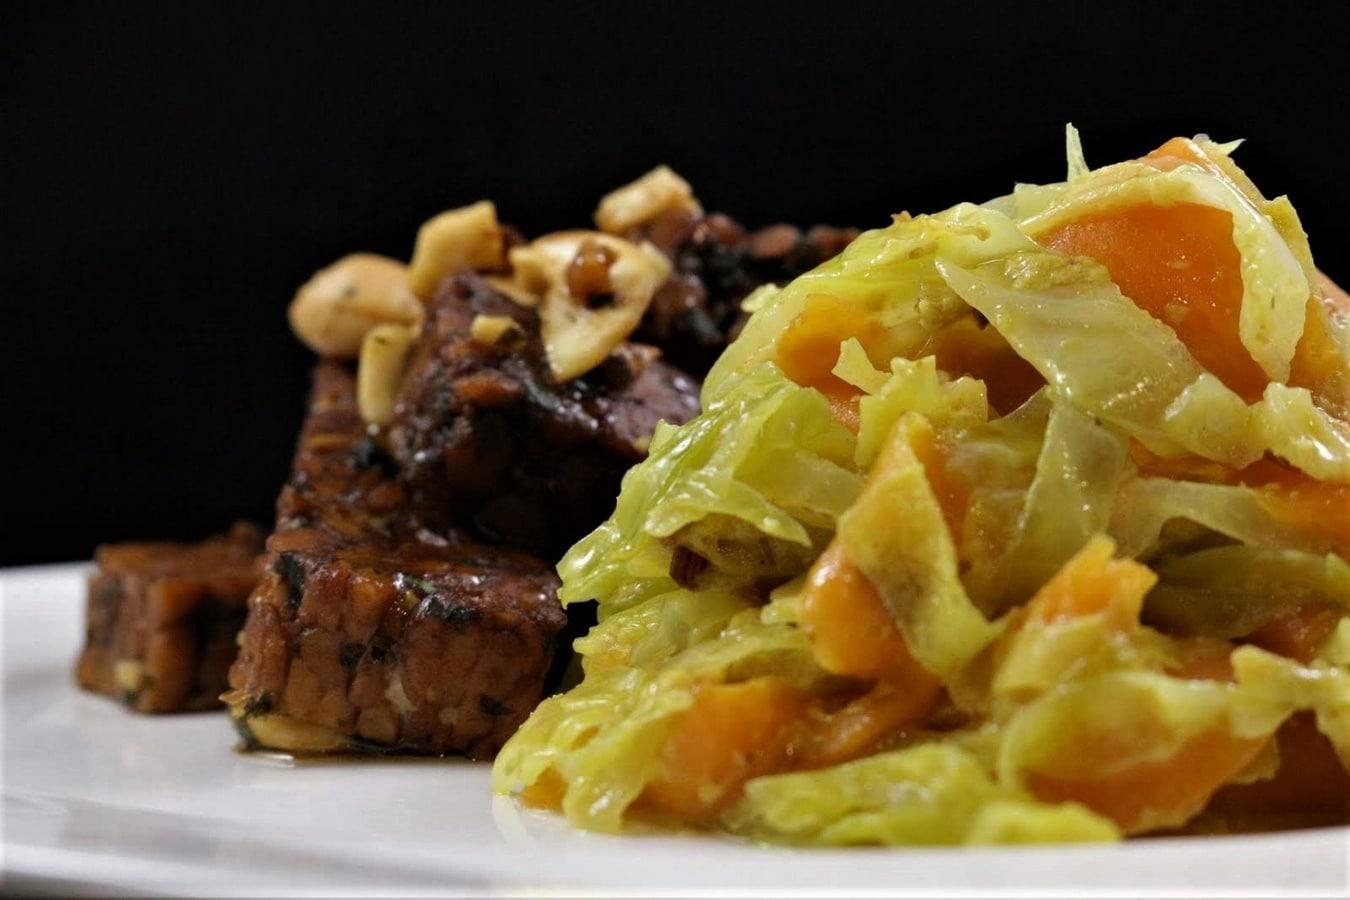 corso di cucina di base a torino scuola di cucina a torino corso di cucina la palestra del cibo cucina e pasticceria a torino